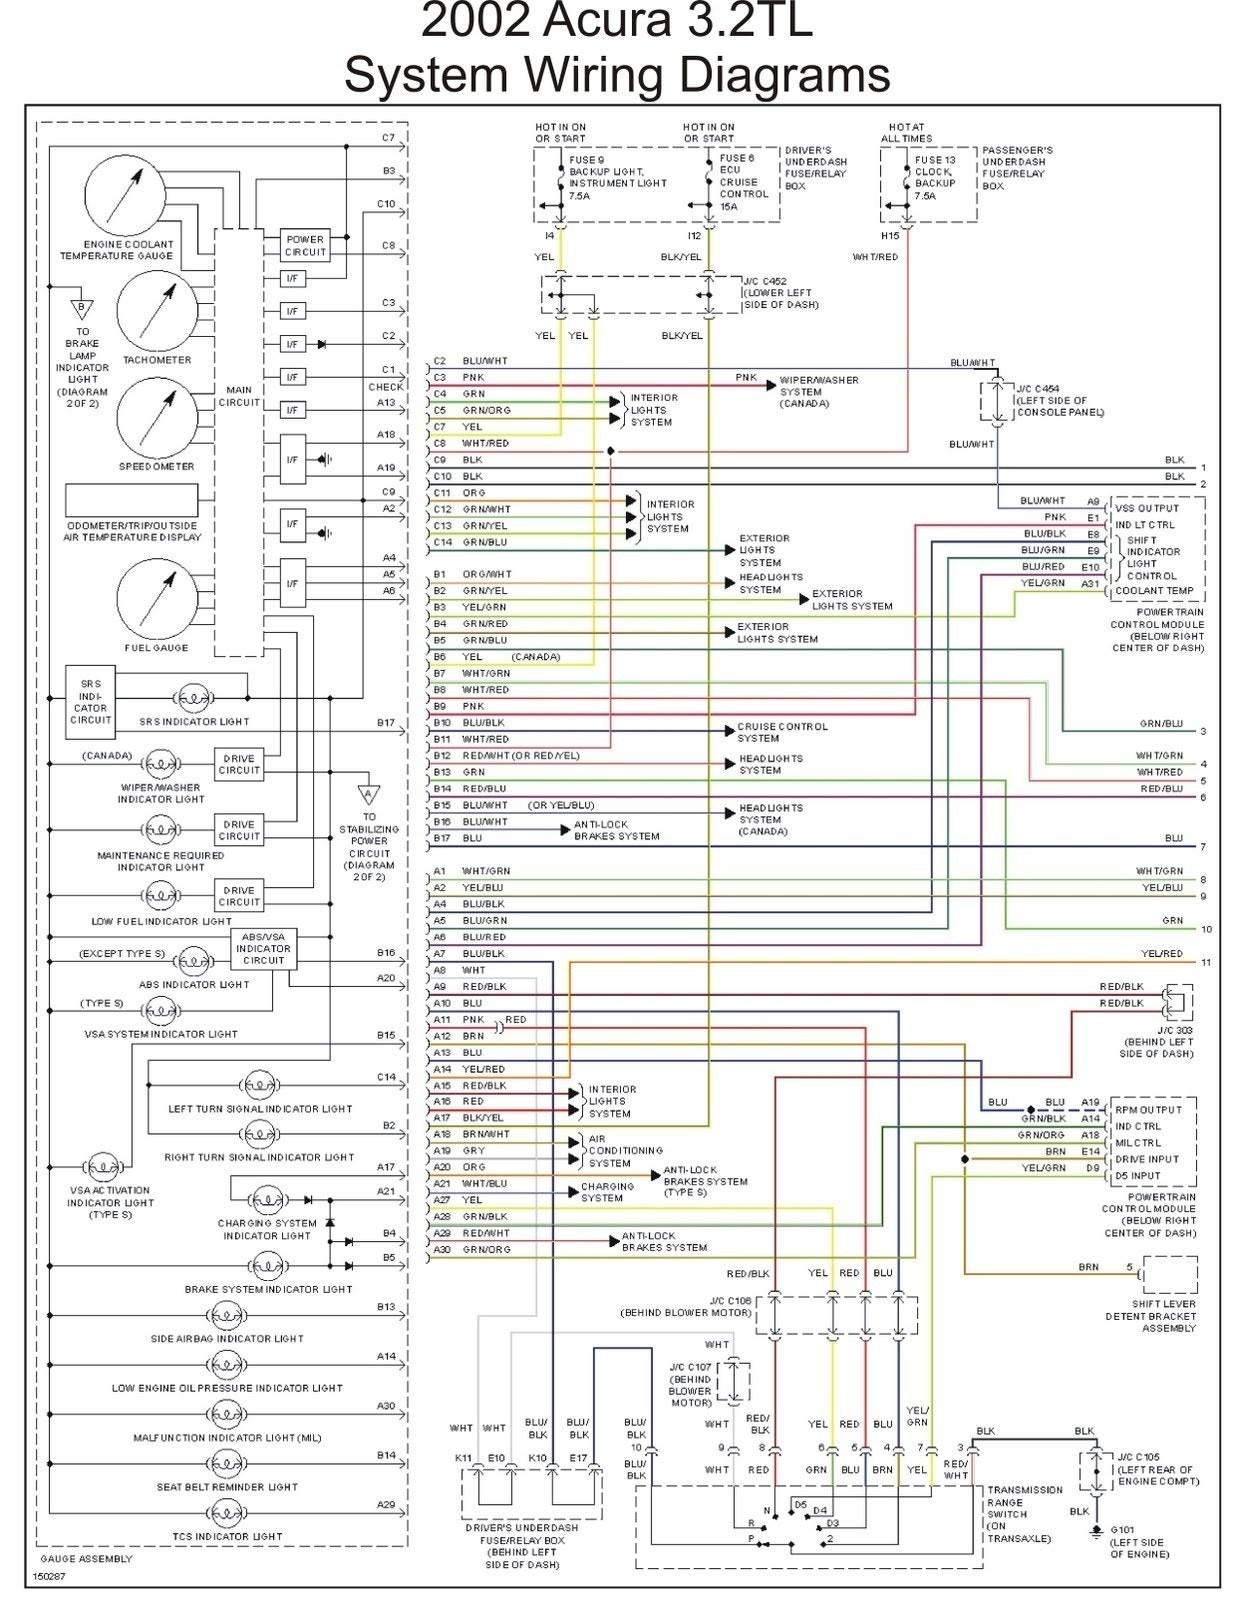 95 Honda Civic Engine Diagram Honda Civic Fuse Box Diagram Gmc Yukon Engine Bustion Chamber Of 95 Honda Civic Engine Diagram